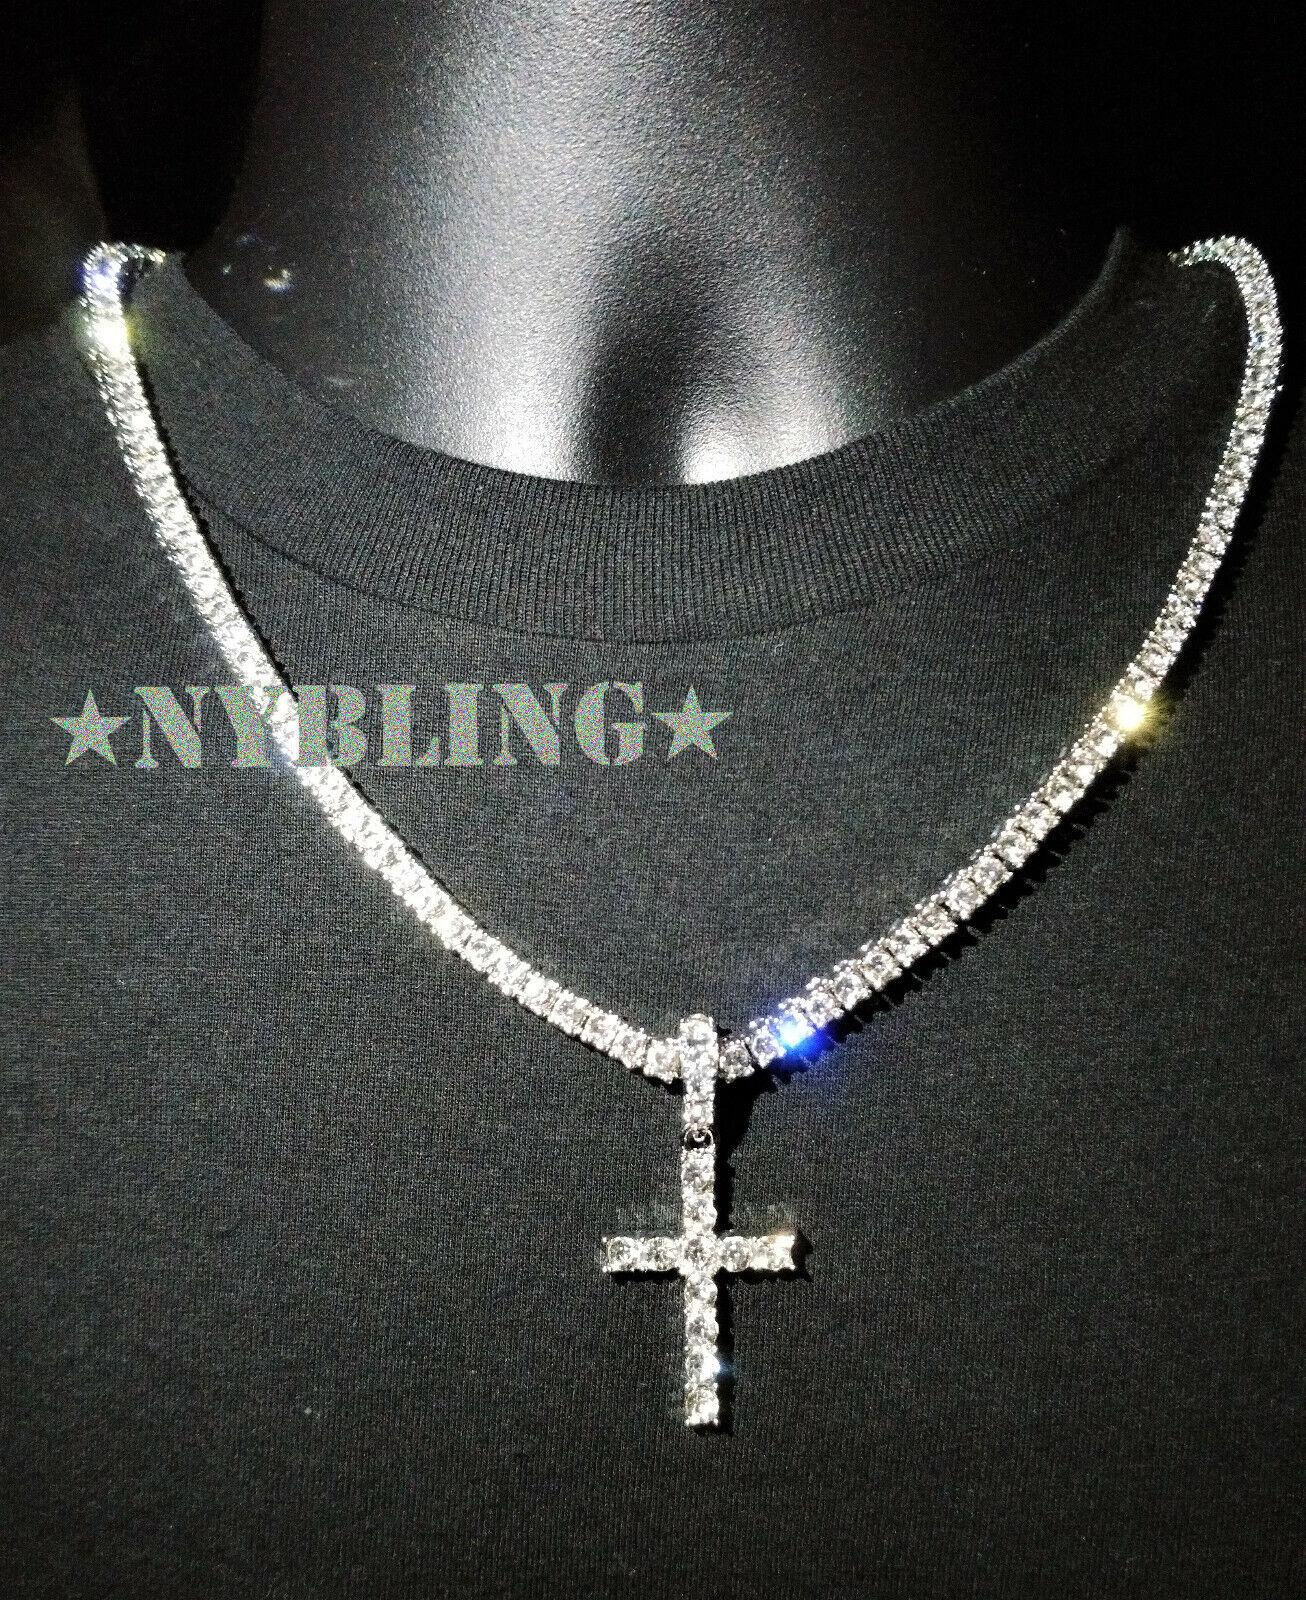 Jewellery - 14k Gold Silver IP Tennis Chain Cross Pendant Choker Lab Diamond ICED Necklace